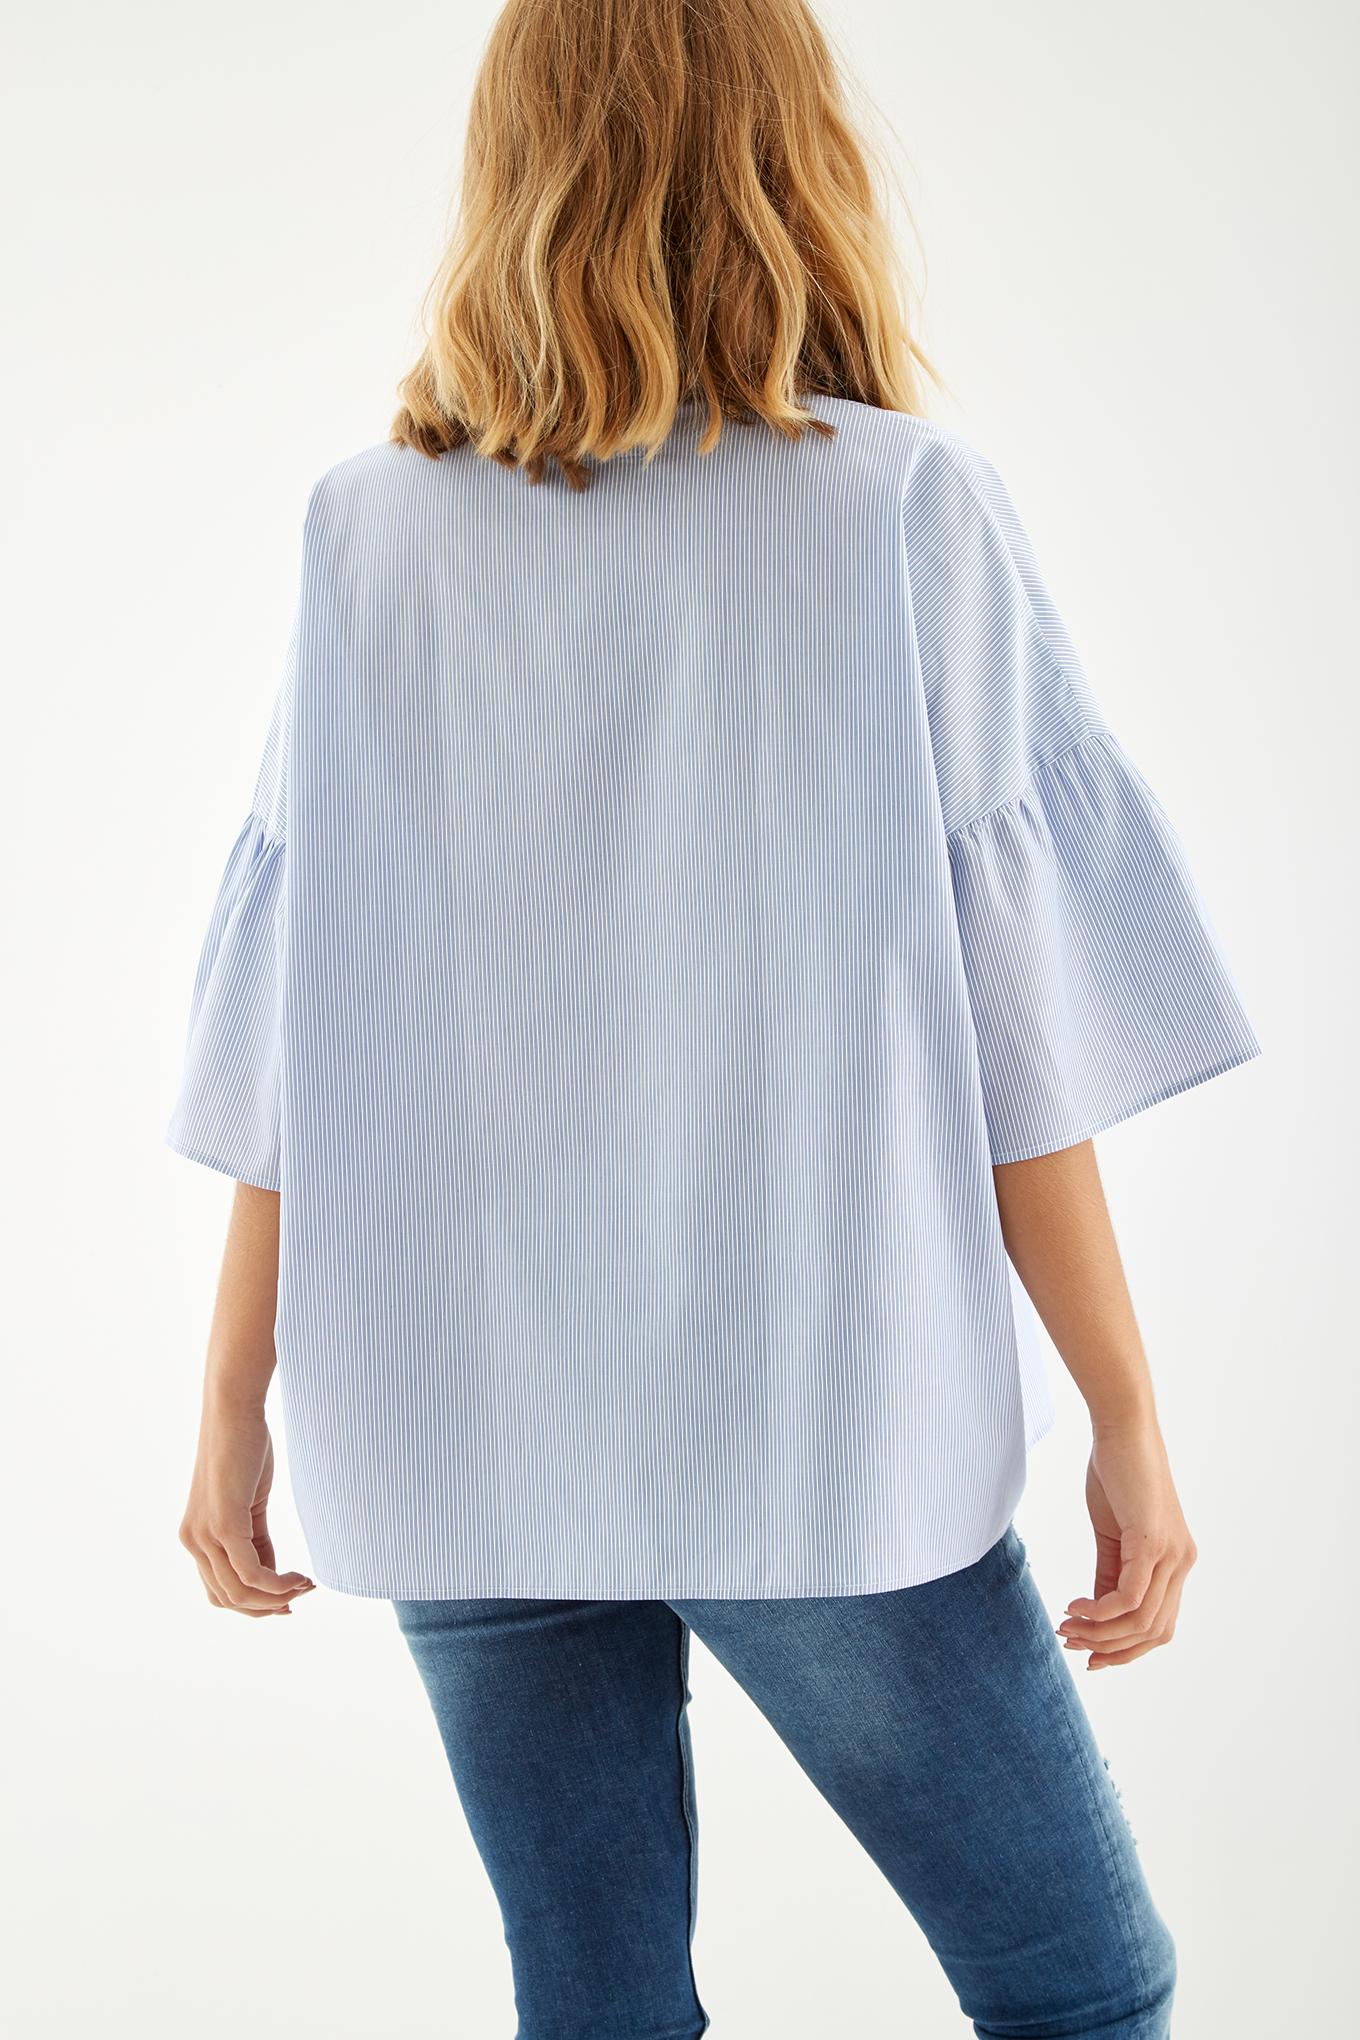 Blusa Azul Casual Mulher